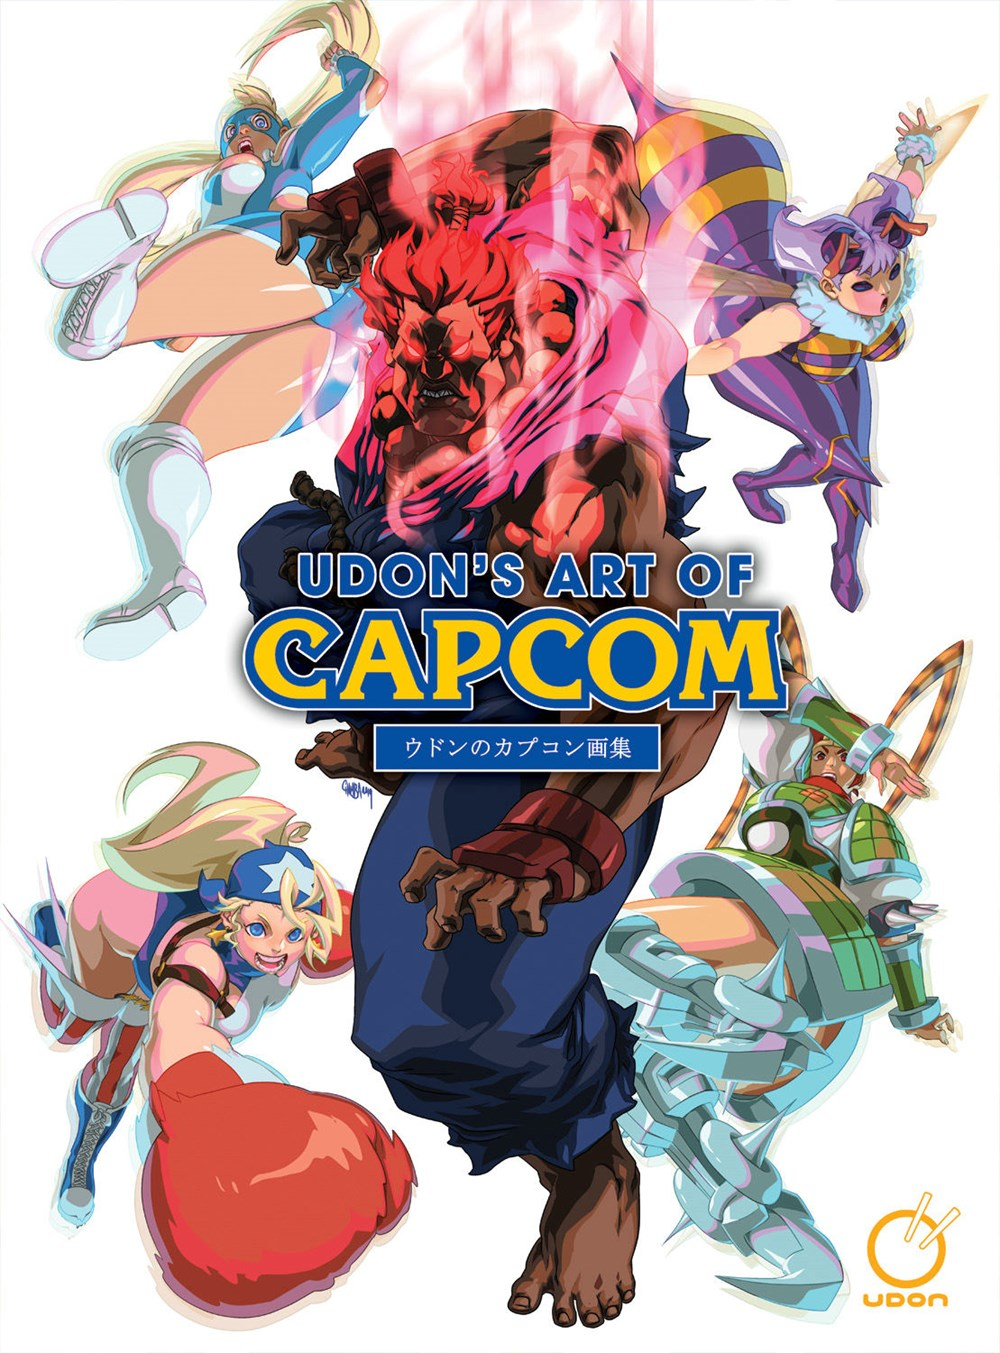 Udons Art of Capcom Volume 1 Artbook (Hardcover)